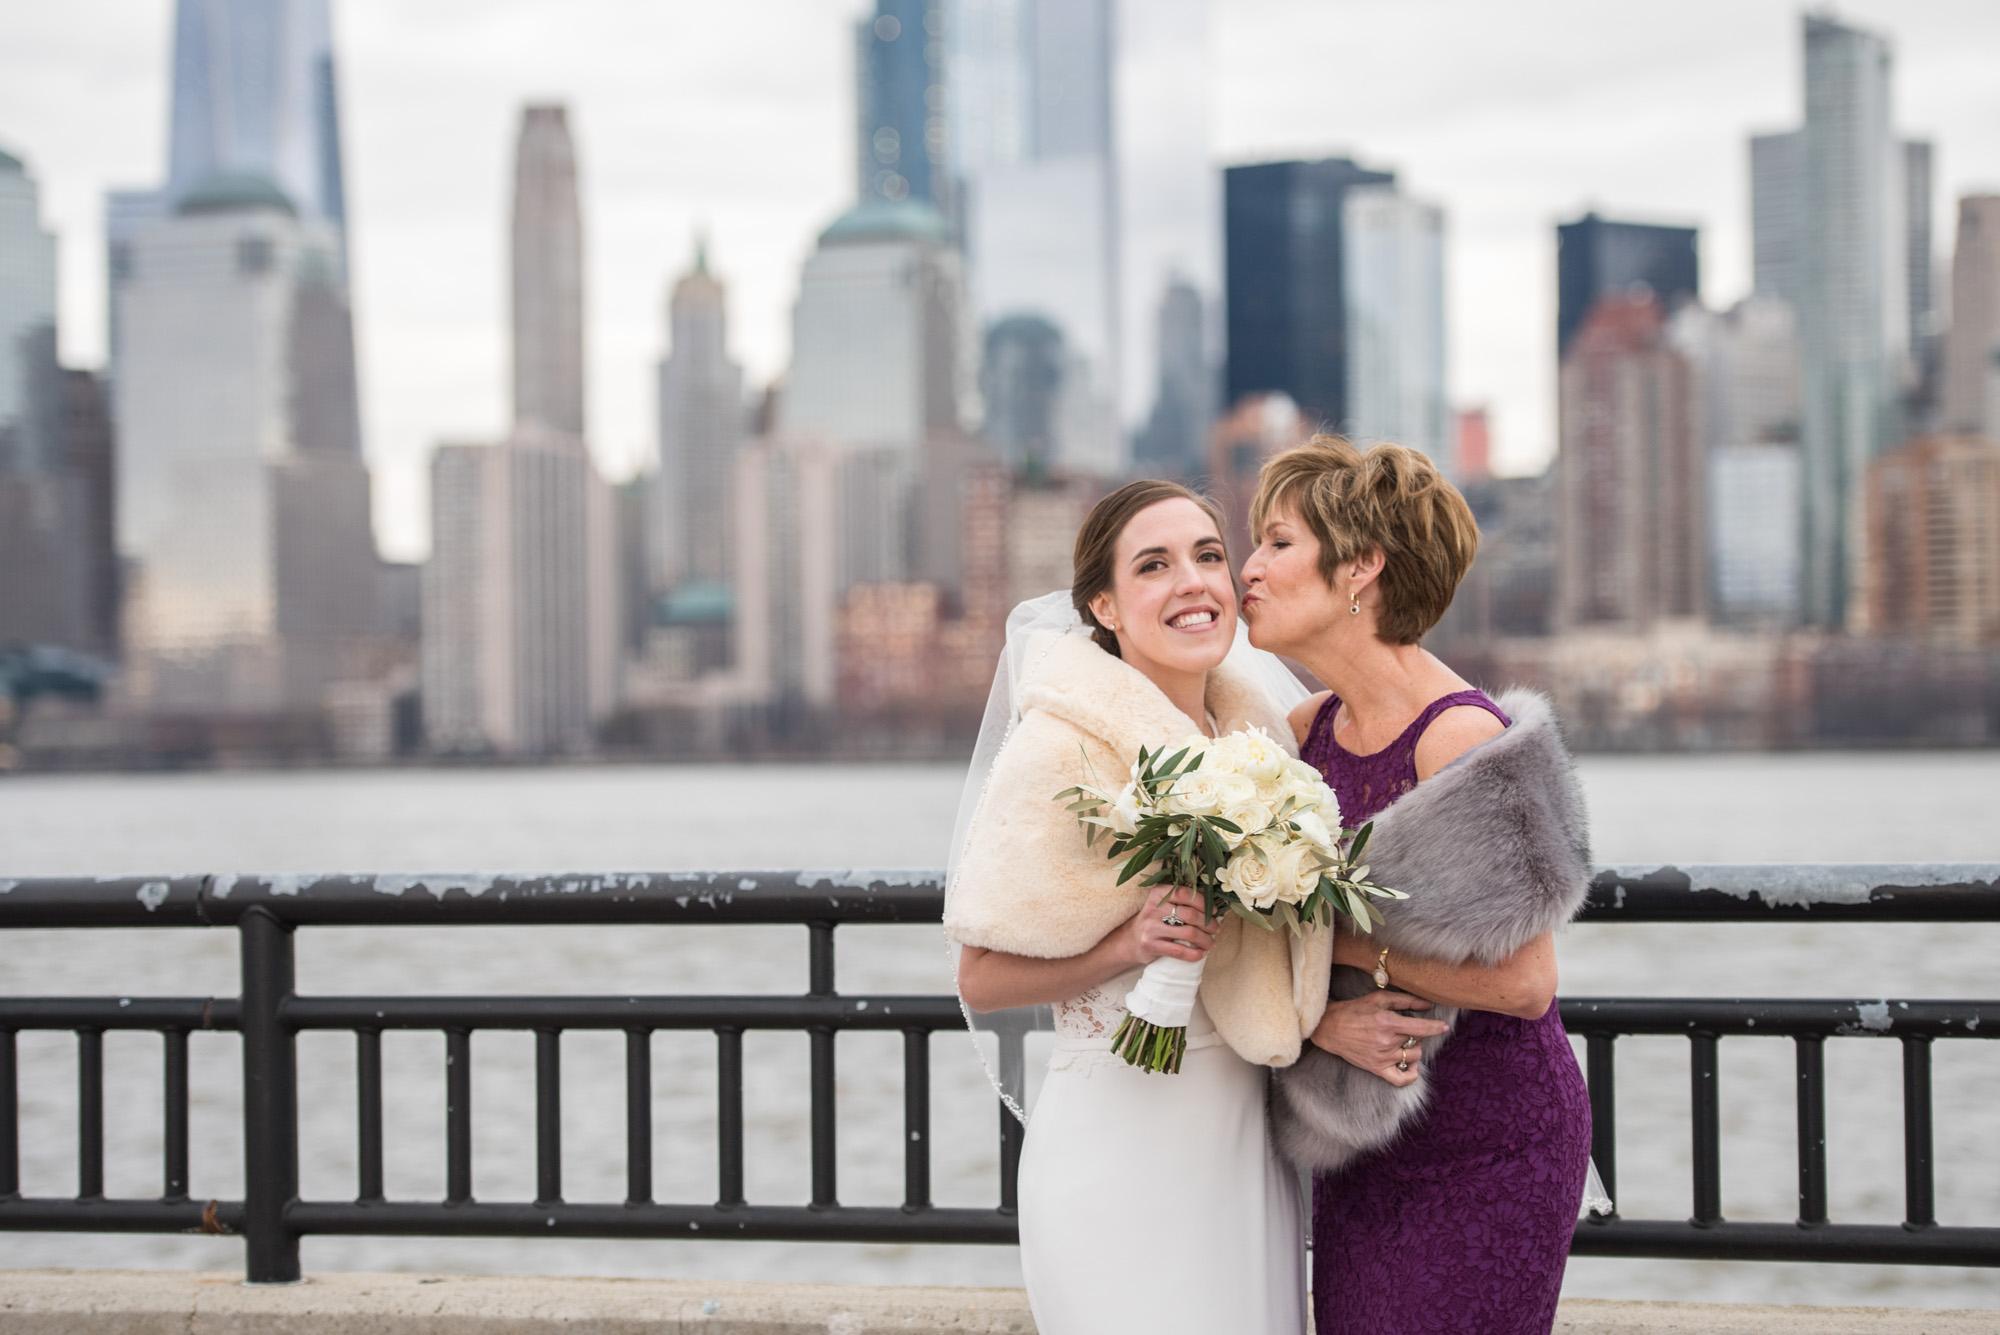 nj-wedding-photographer-maritime-parc-maria-david-32.jpg